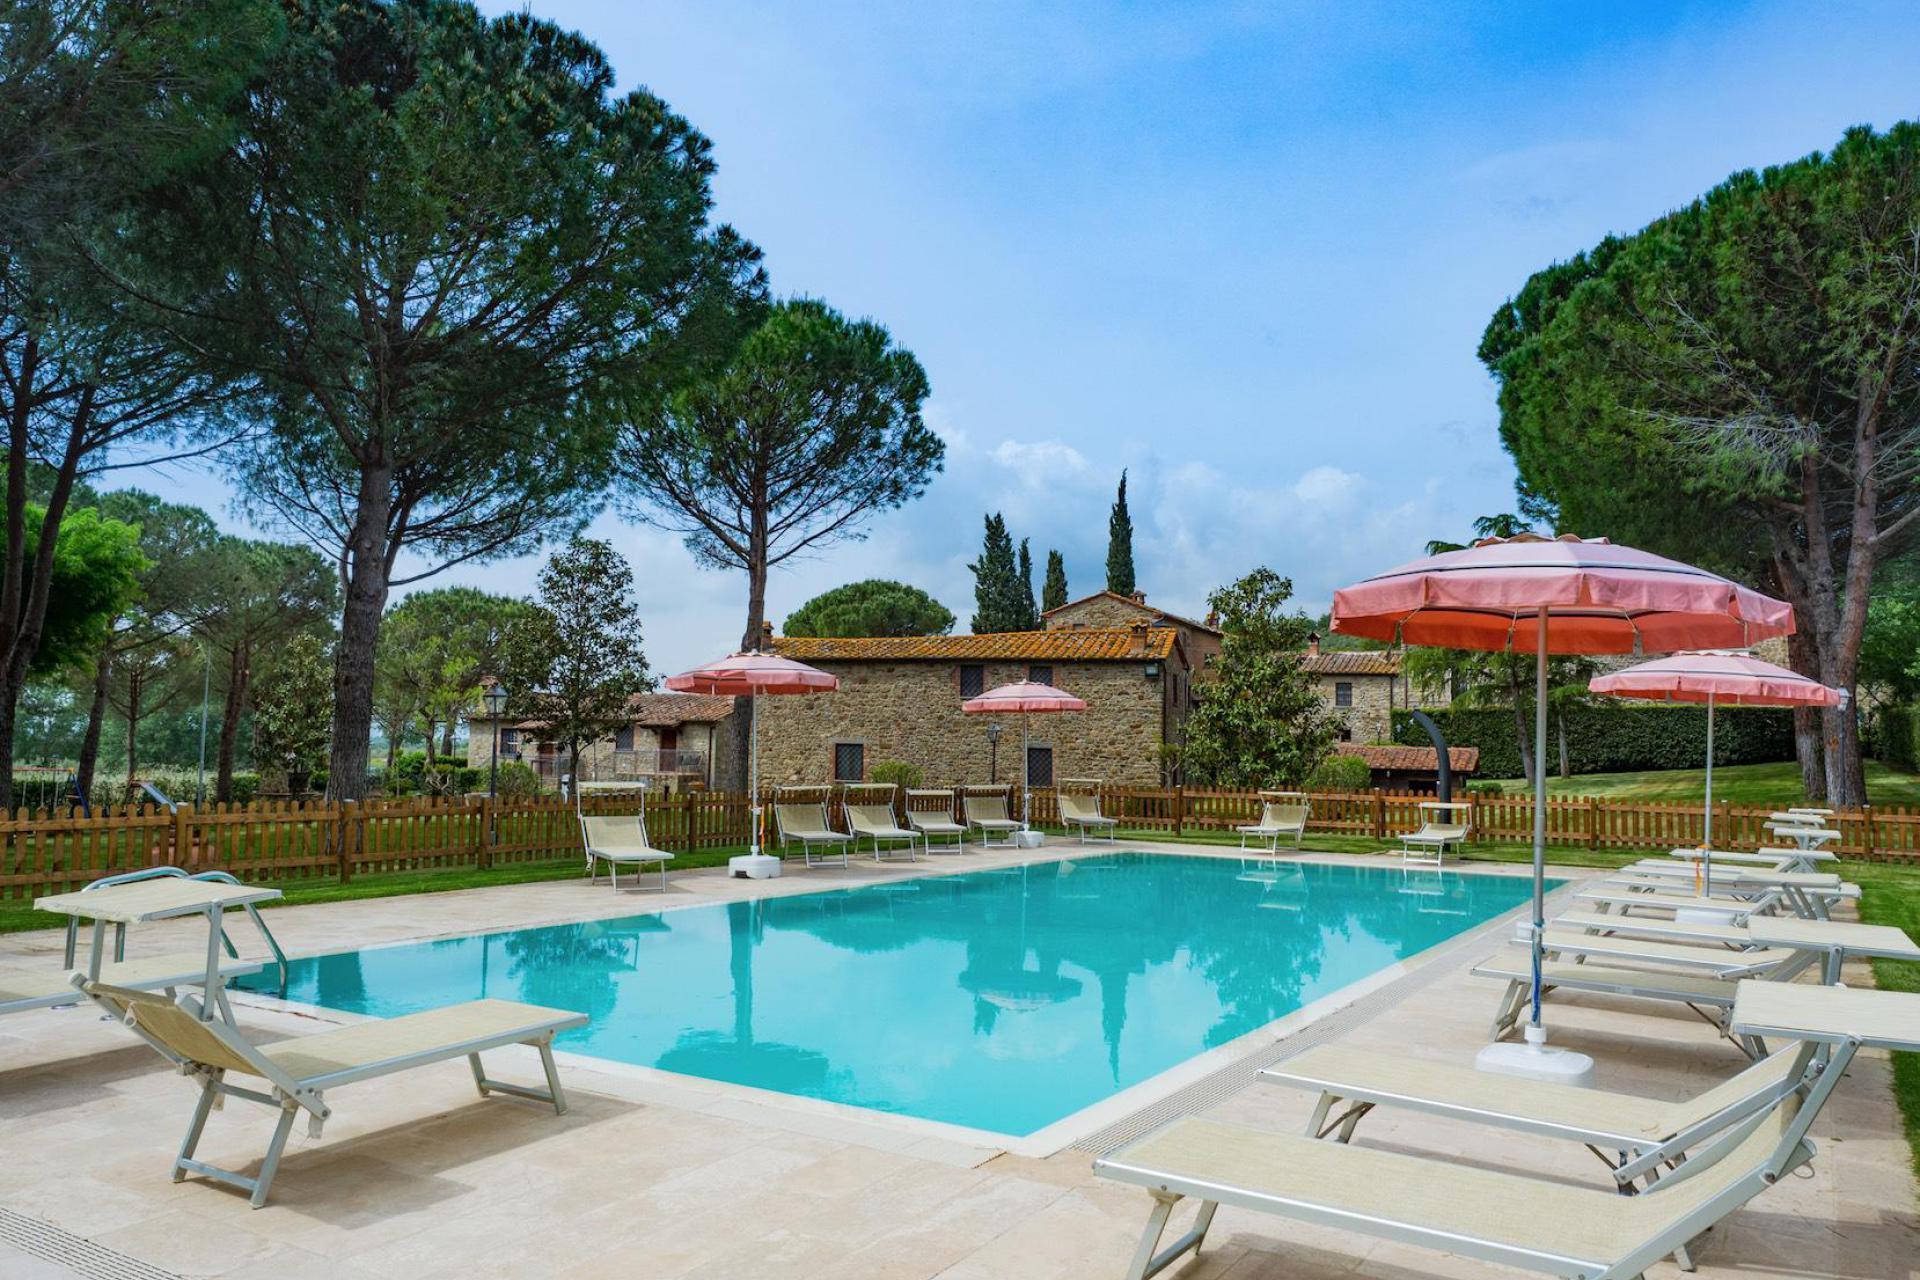 Agriturismo Puglia Private trullo with pool in olive orchard